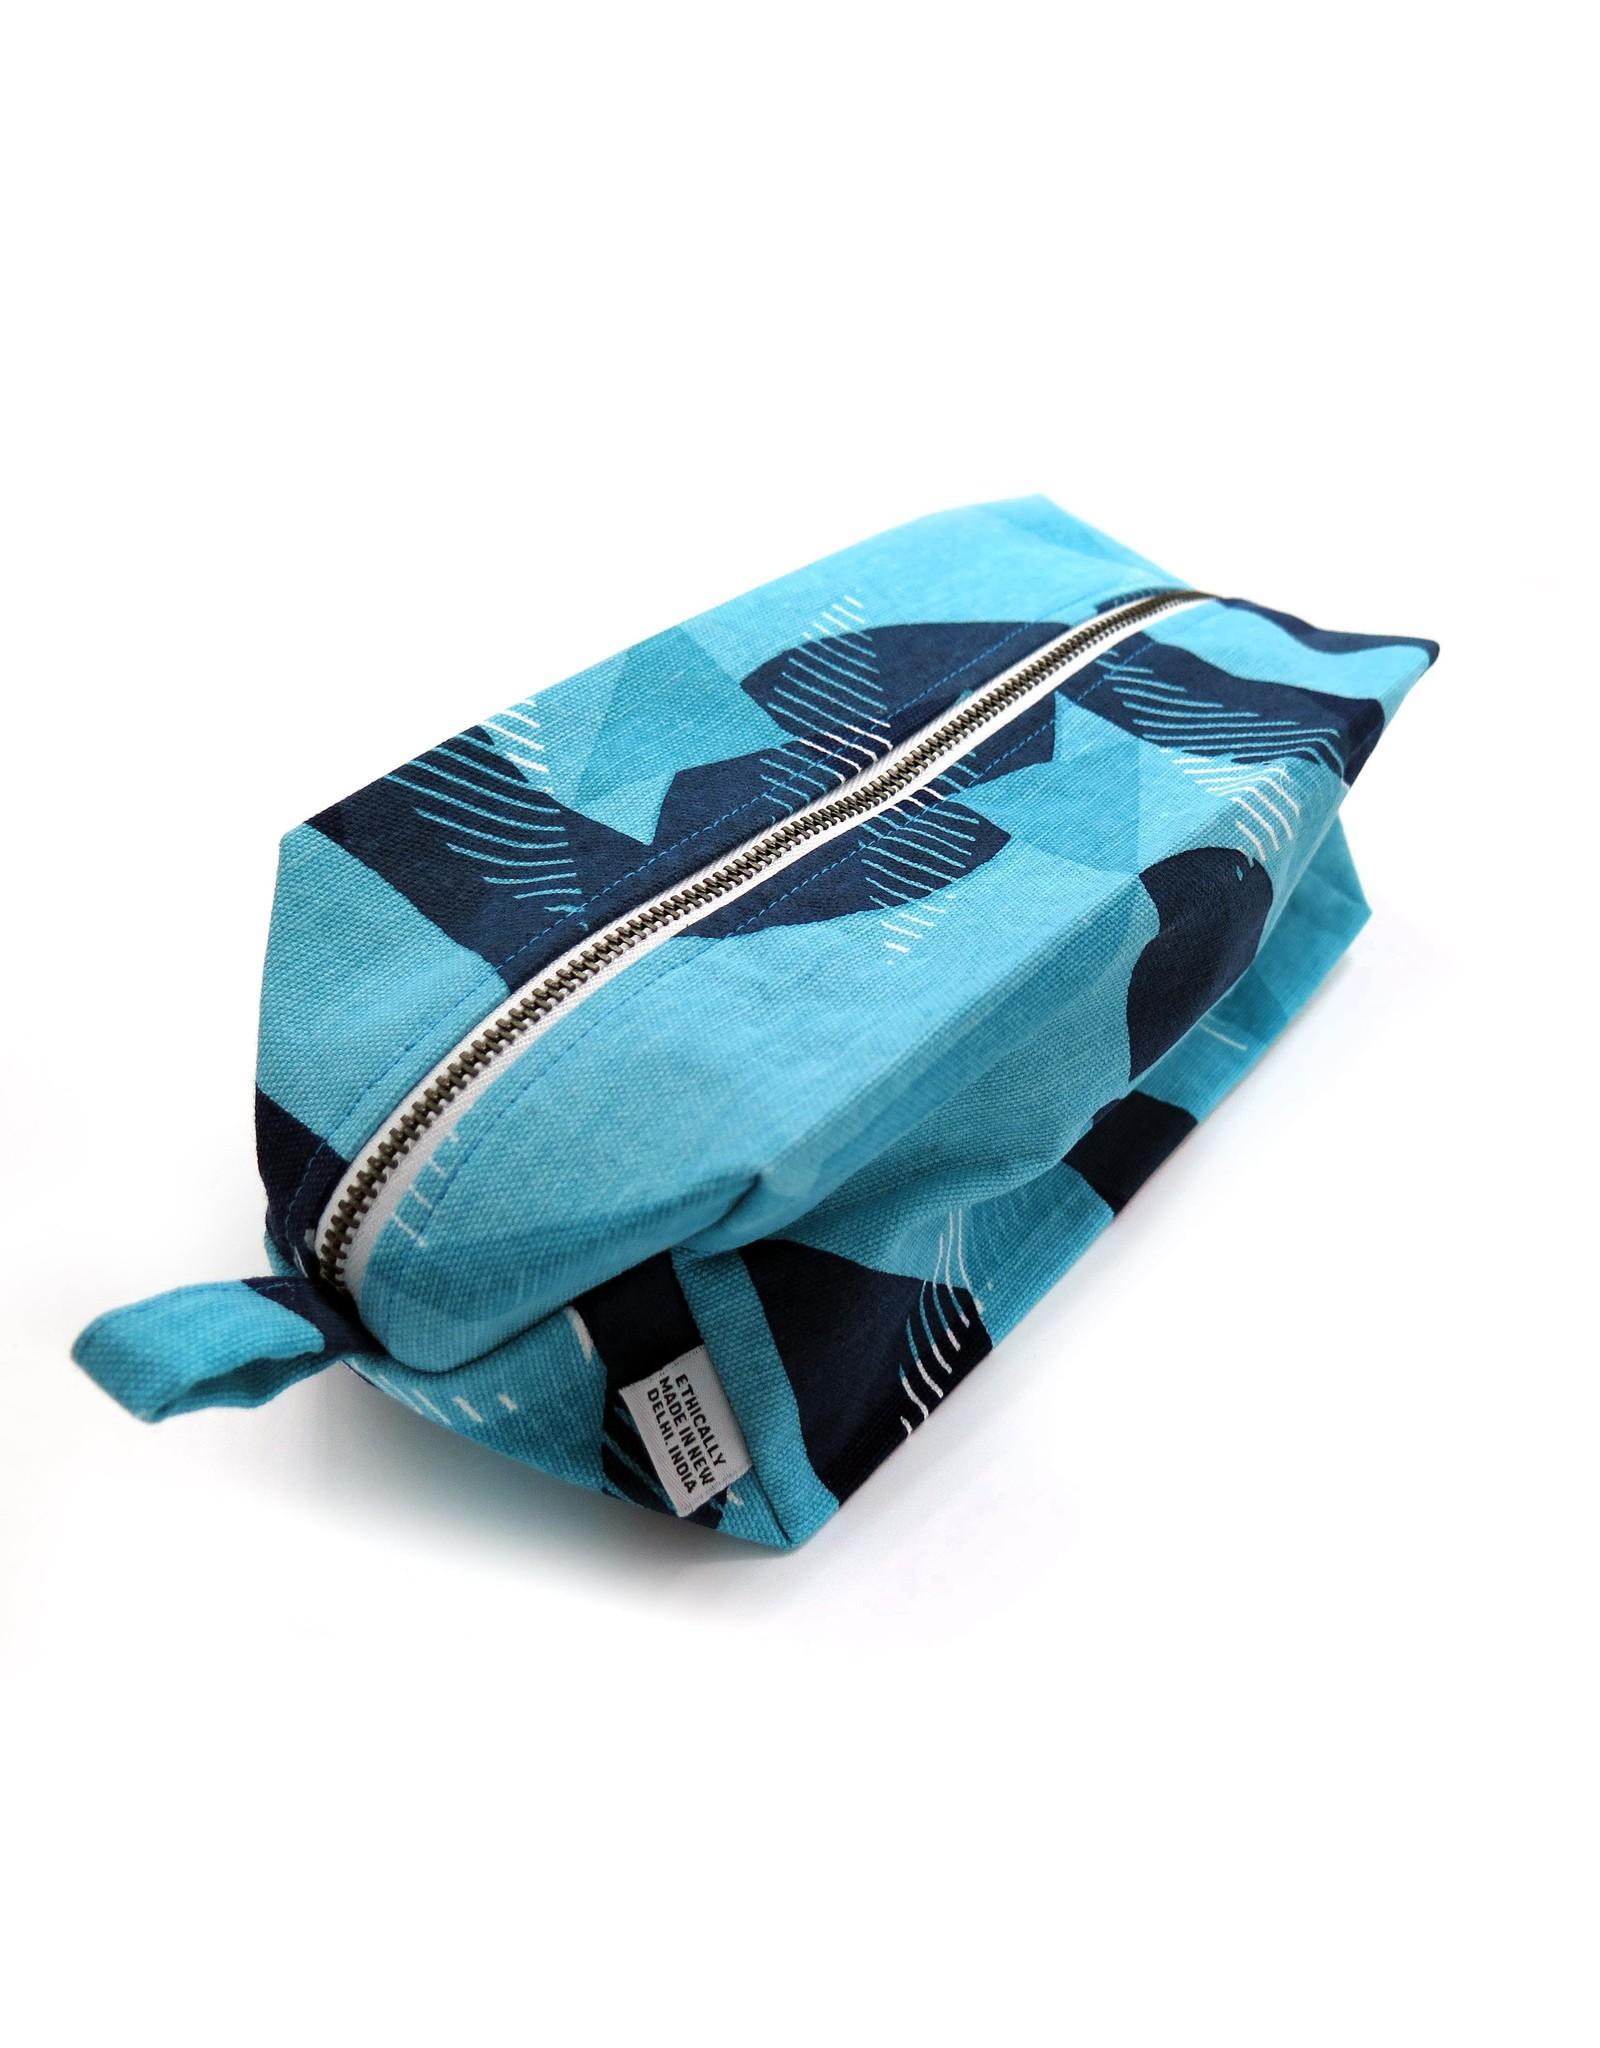 Jigsaw (Blue) Dopp Kit by PINTL + KEYT